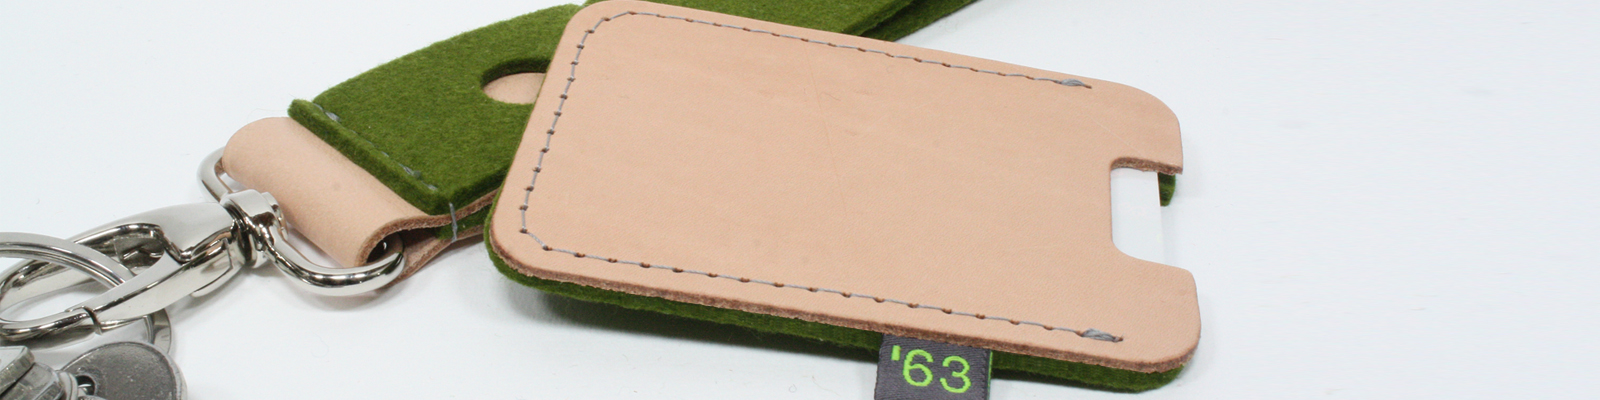 OV chip card hoesje